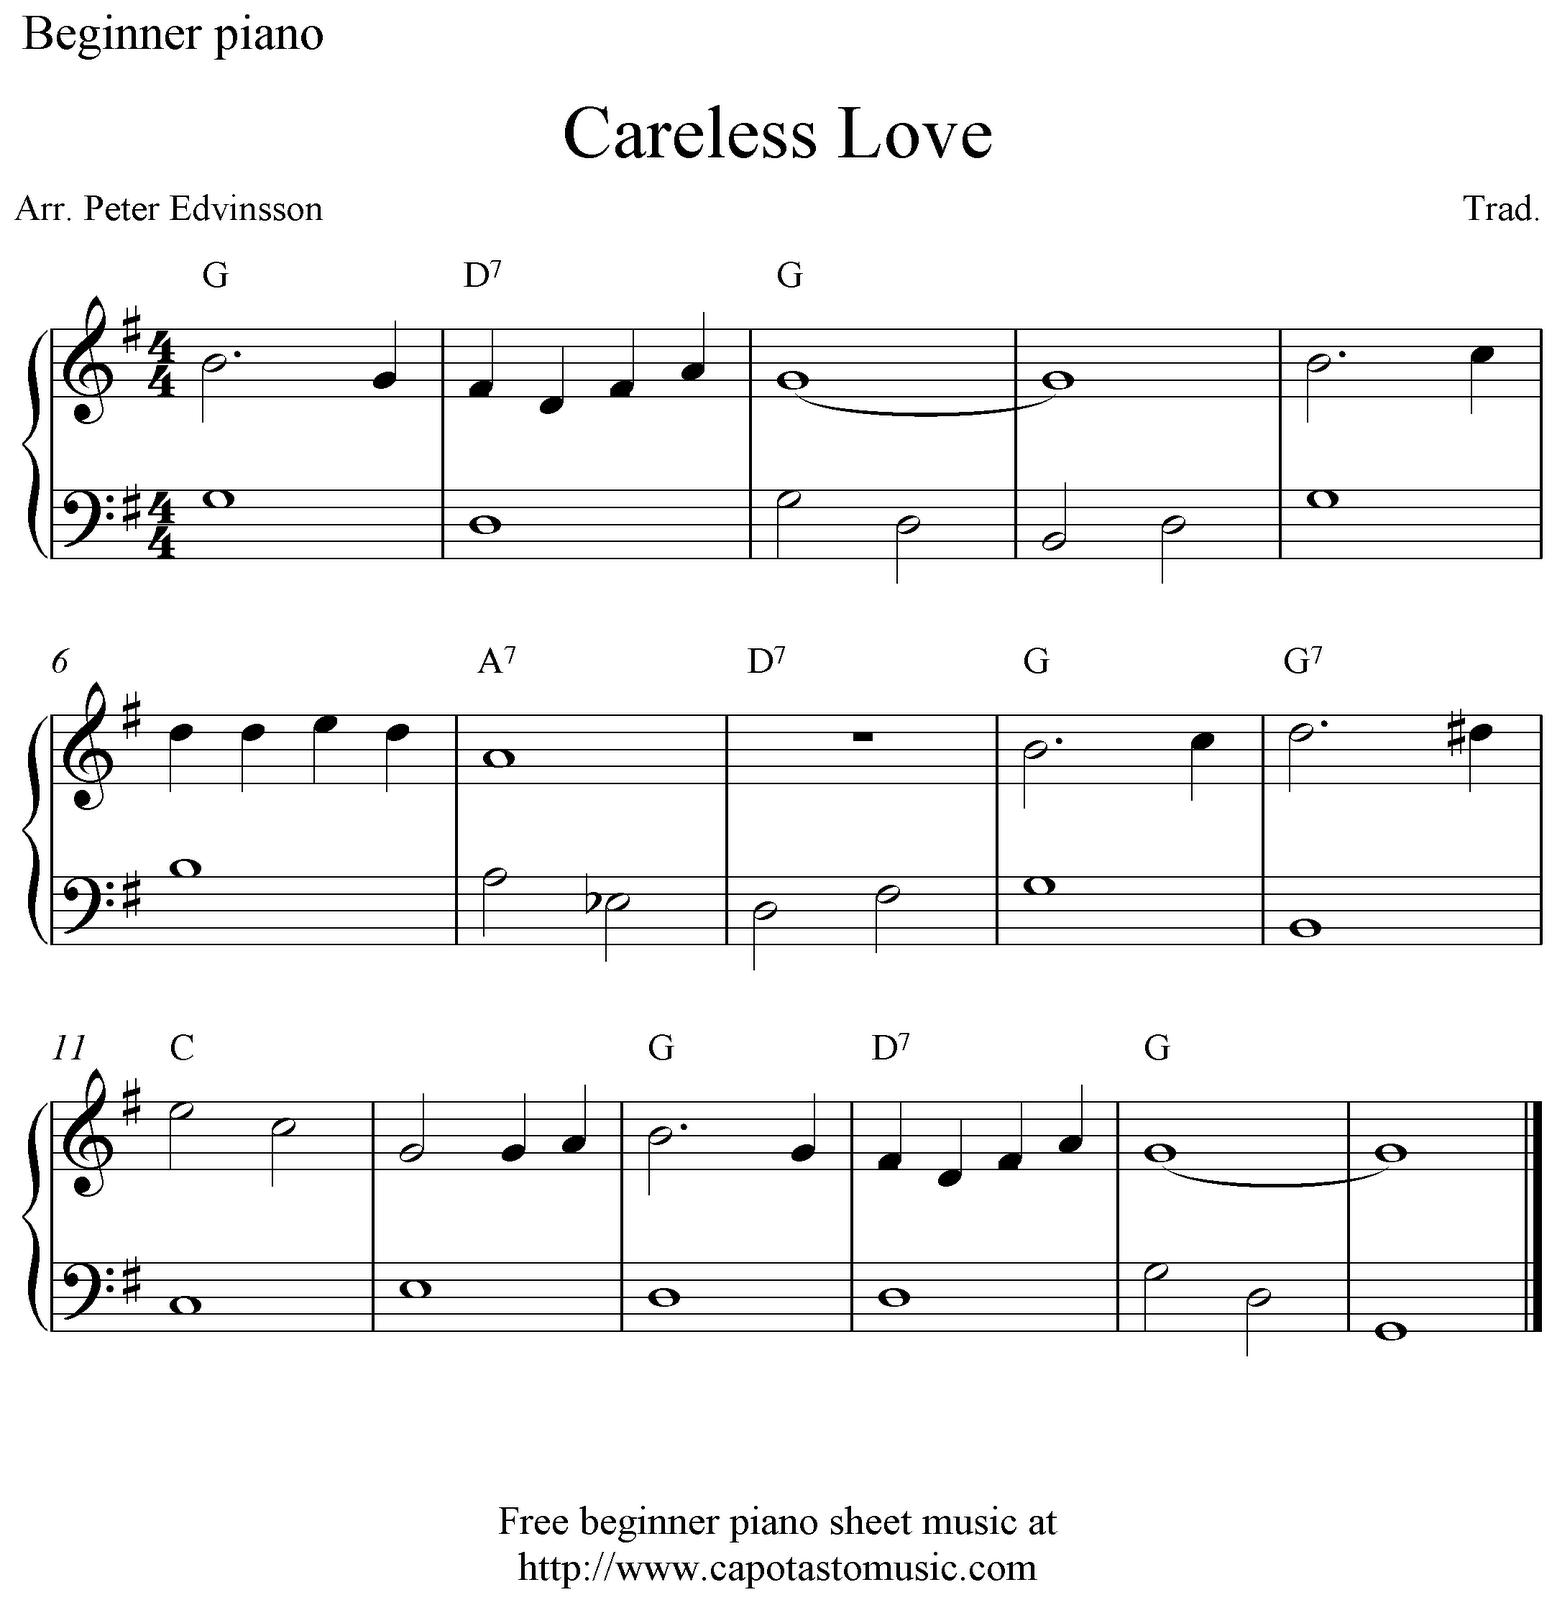 Free Printable Sheet Music For Piano: Capotastomusic: Free Sheet Music Scores... Love This Blog